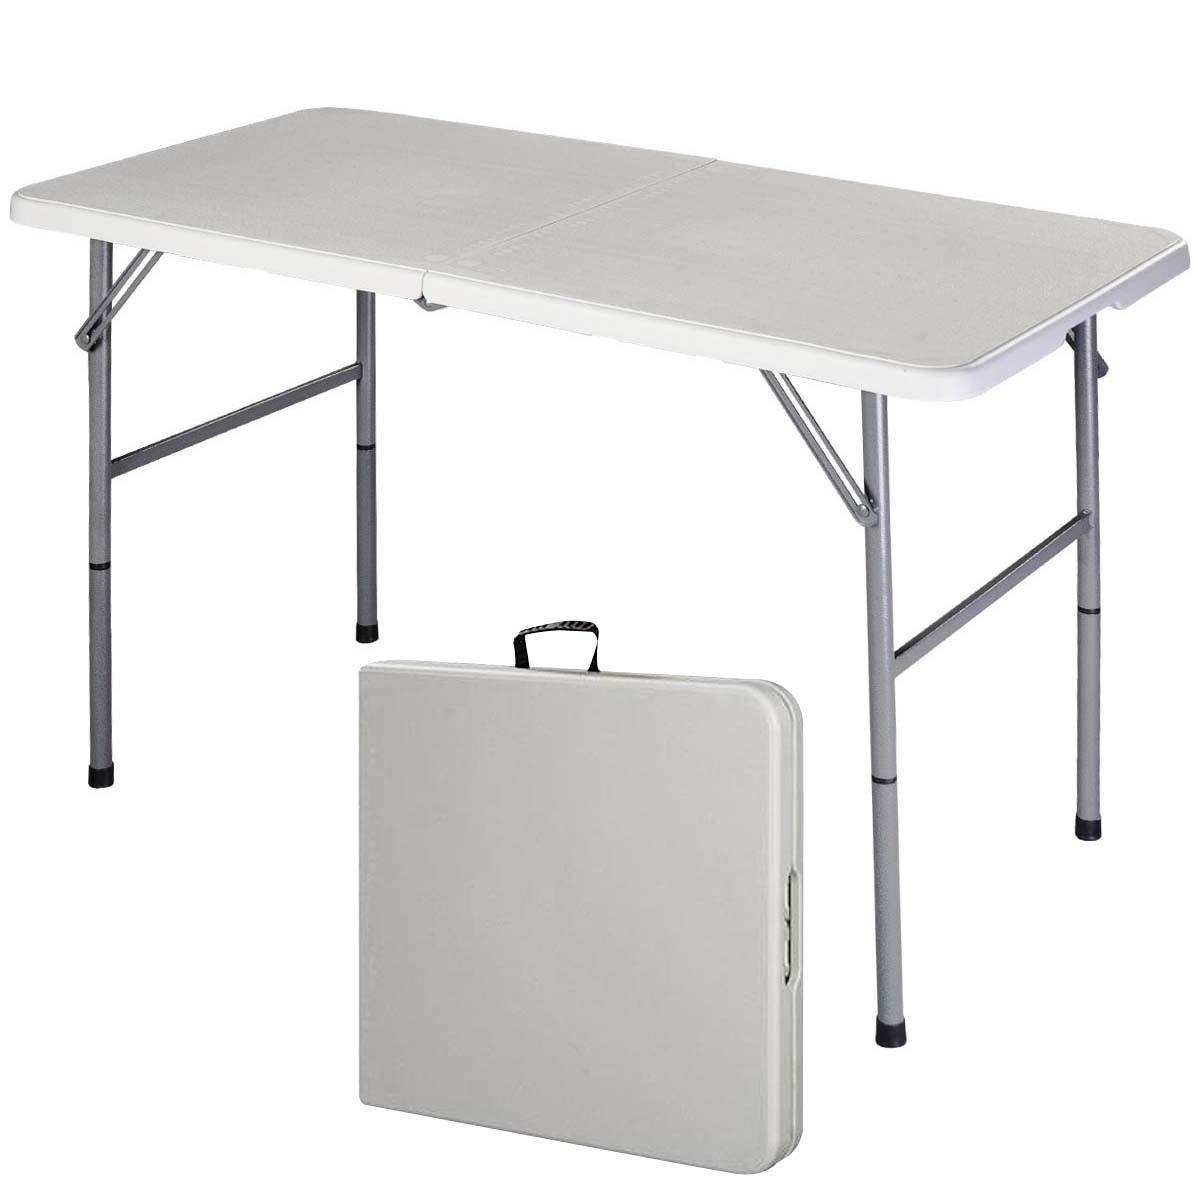 Folding table Lifetime 8u0027 folding table, almond - walmart.com UYZEMRR